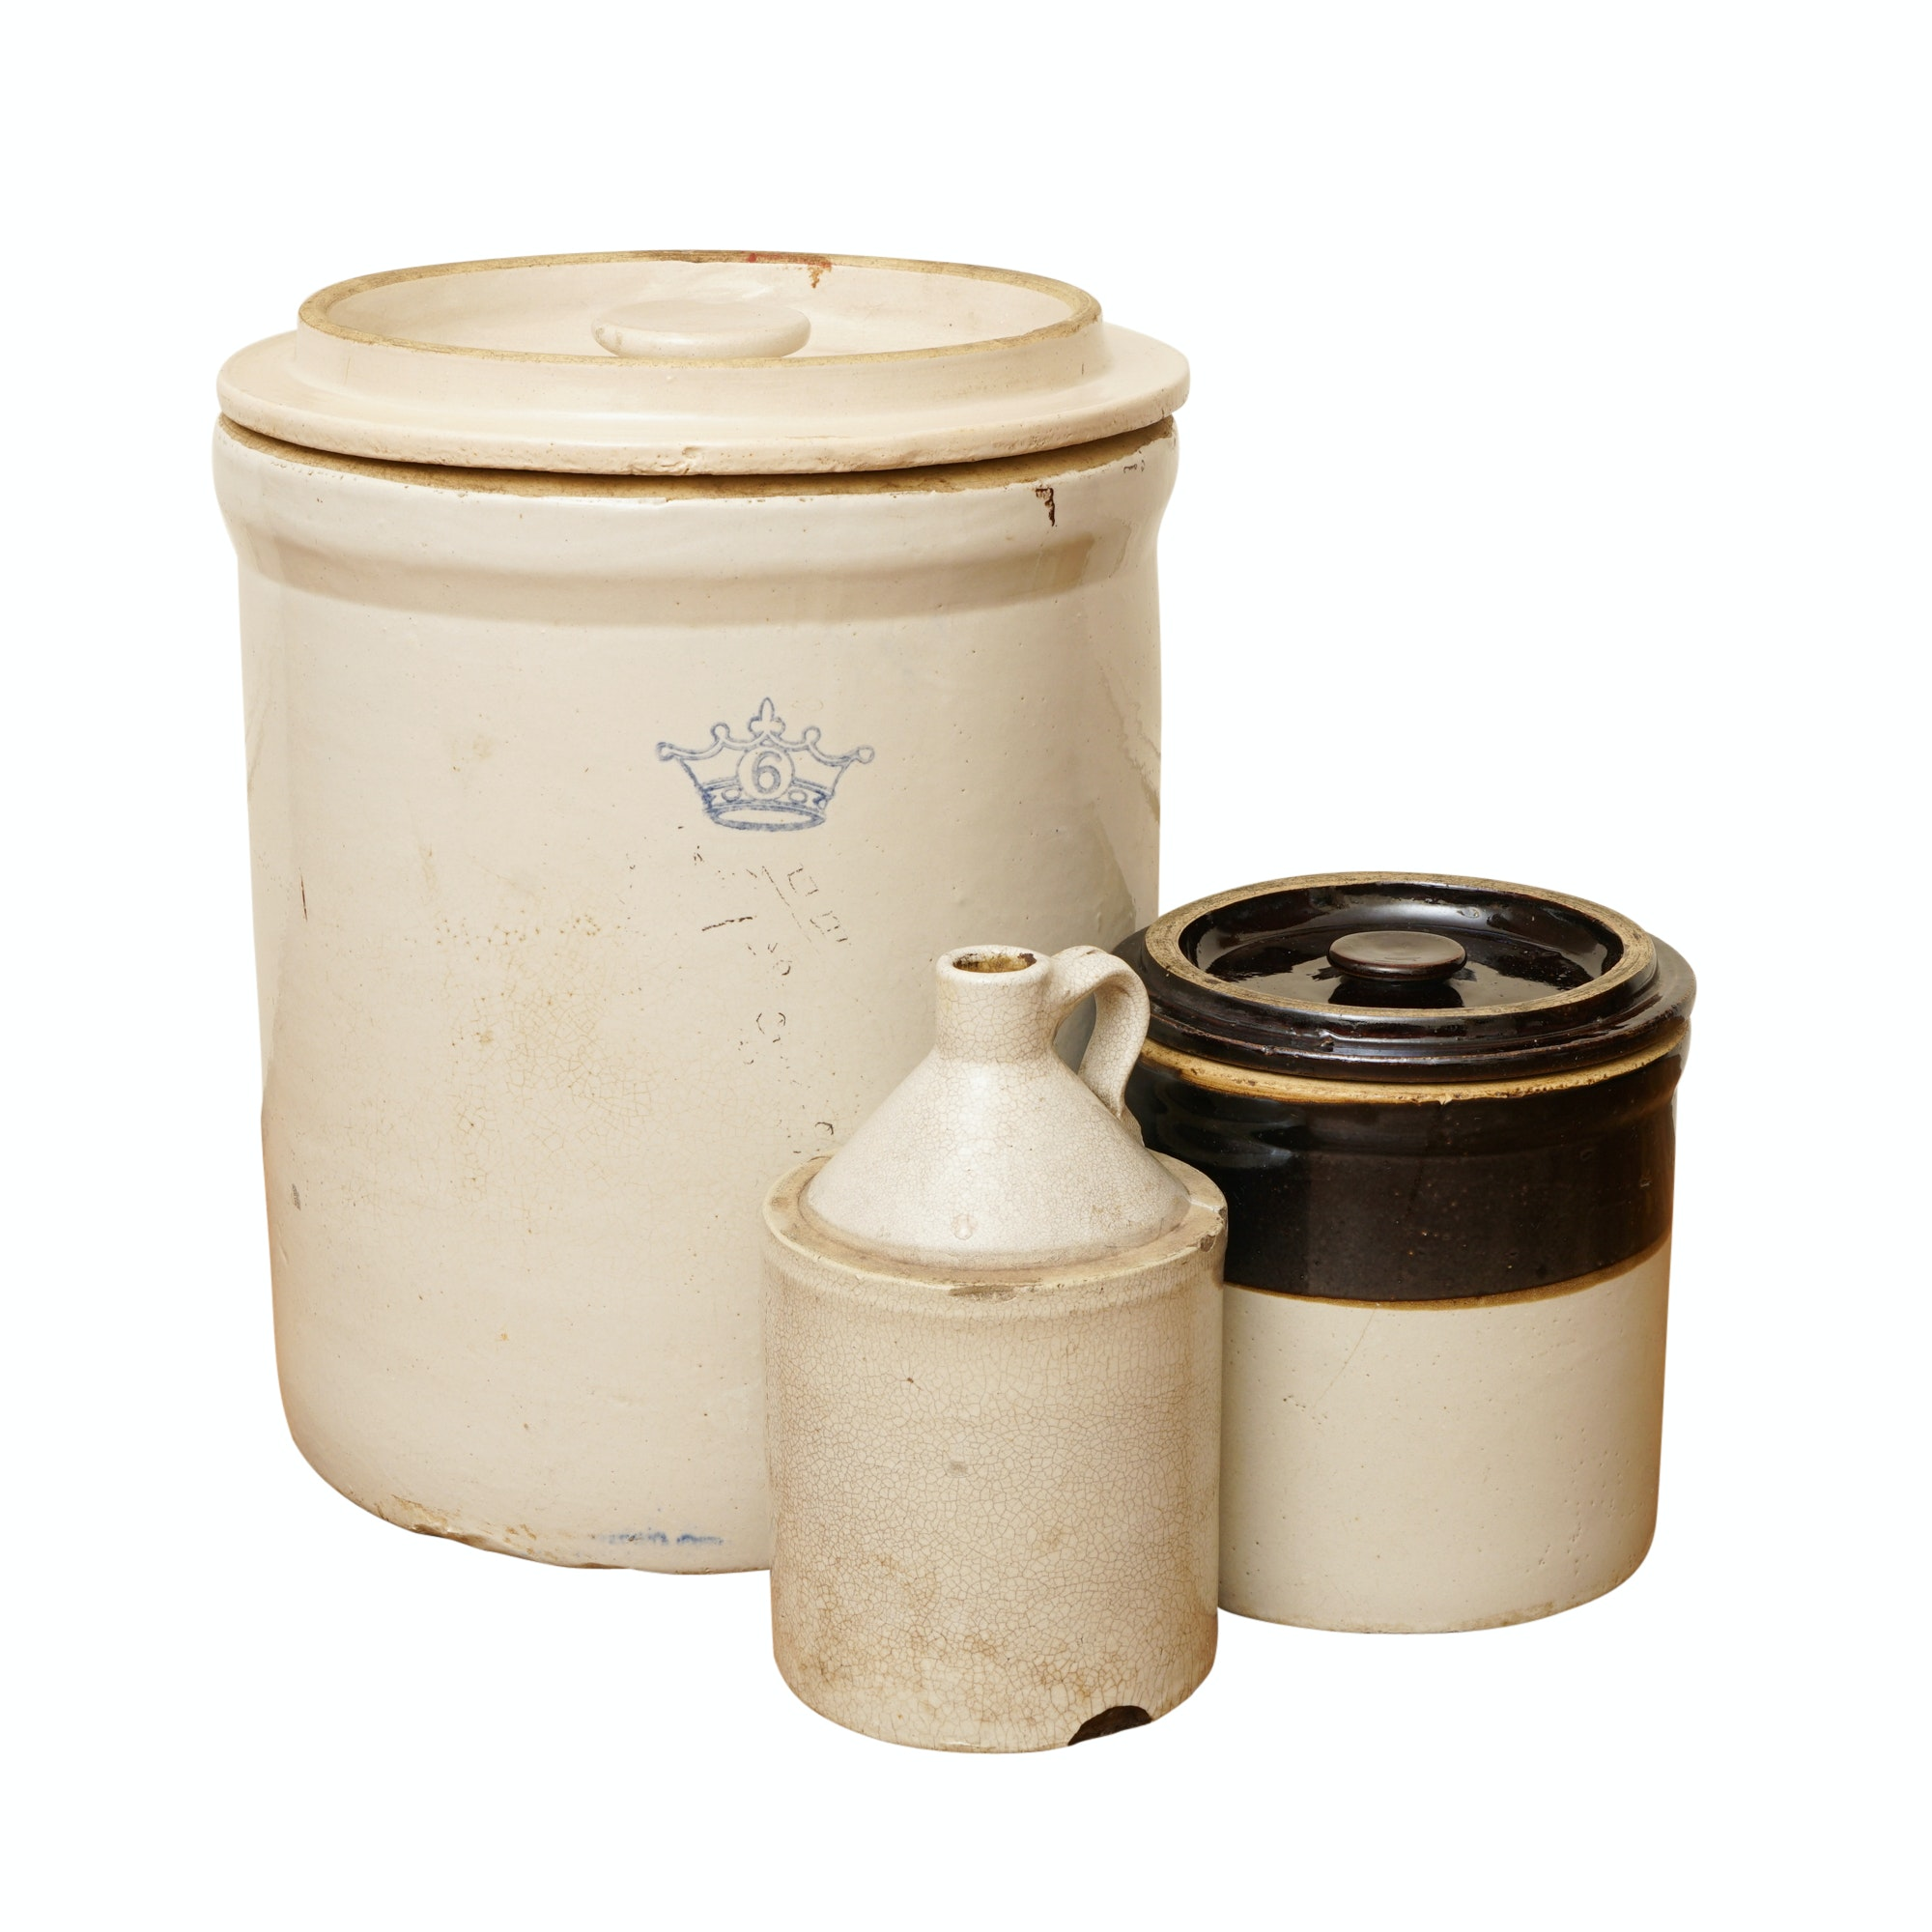 Vintage Stoneware Crocks and Jug featuring Robinson Ransbottom